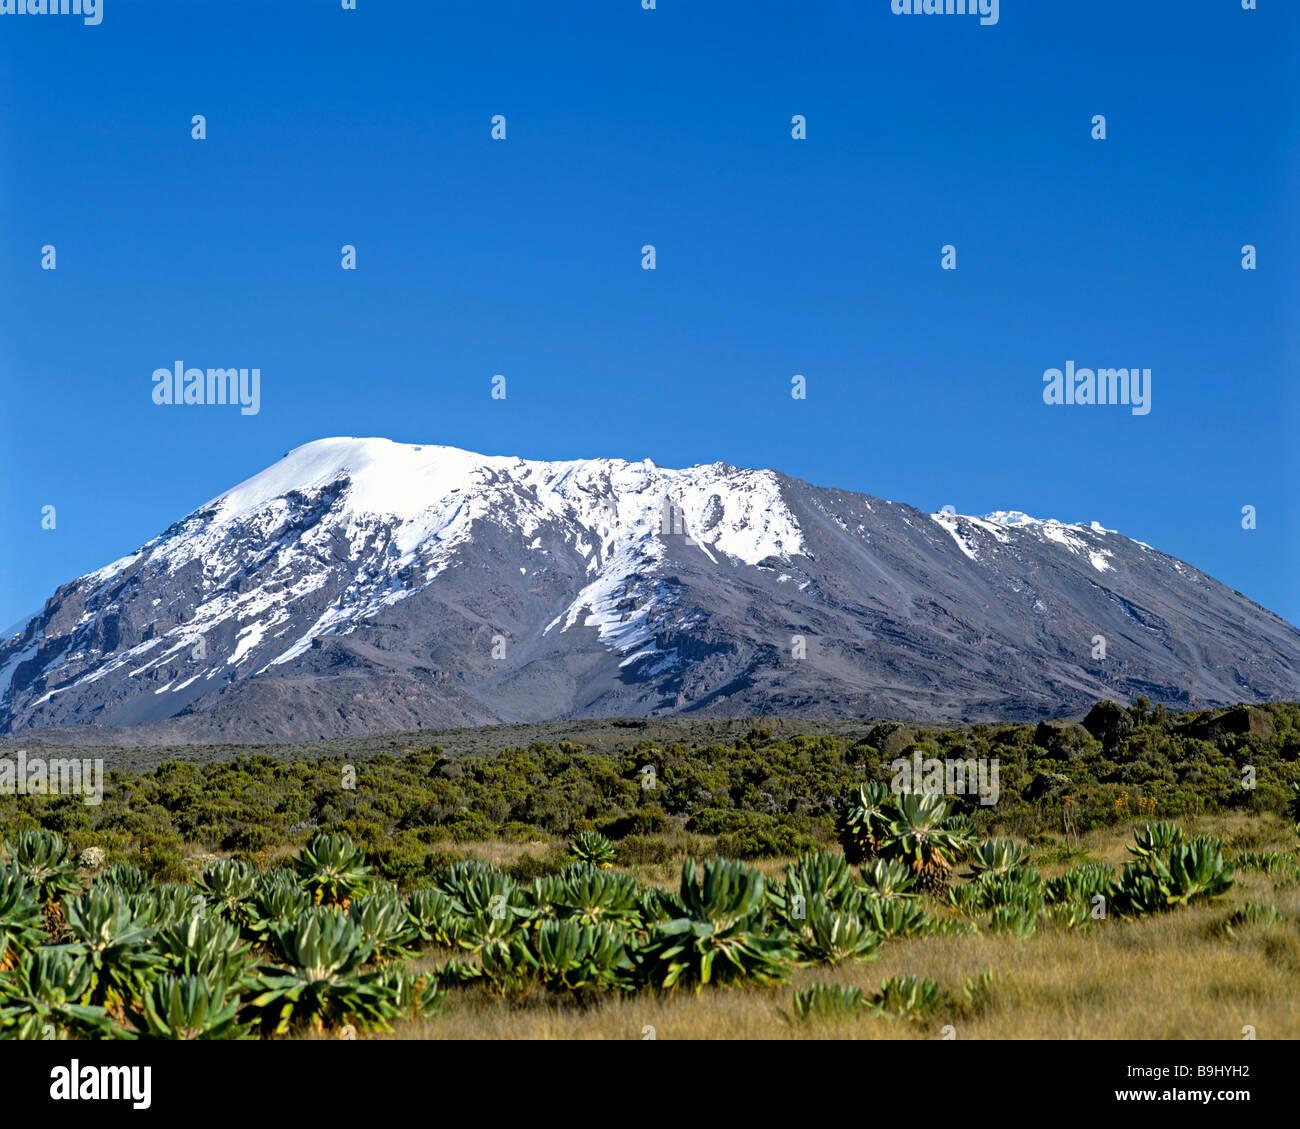 Mount Kilimanjaro, Kilimanjaro National Park, UNESCO World Heritage Site, stratovolcano, Tanzania, East Africa - Stock Image